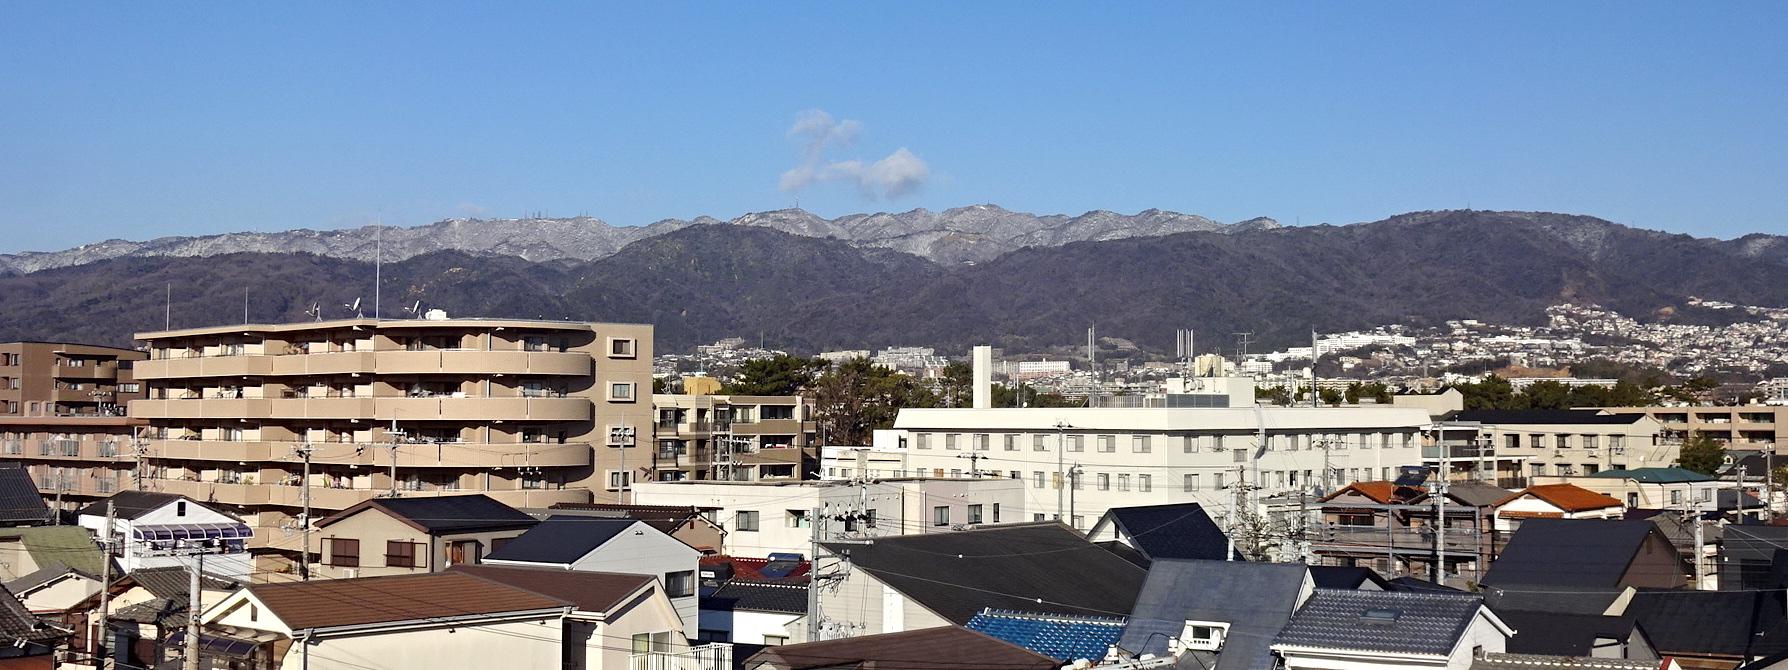 http://cdn-ak.f.st-hatena.com/images/fotolife/s/shioshiohida/20180111/20180111092612_original.jpg?1515724780